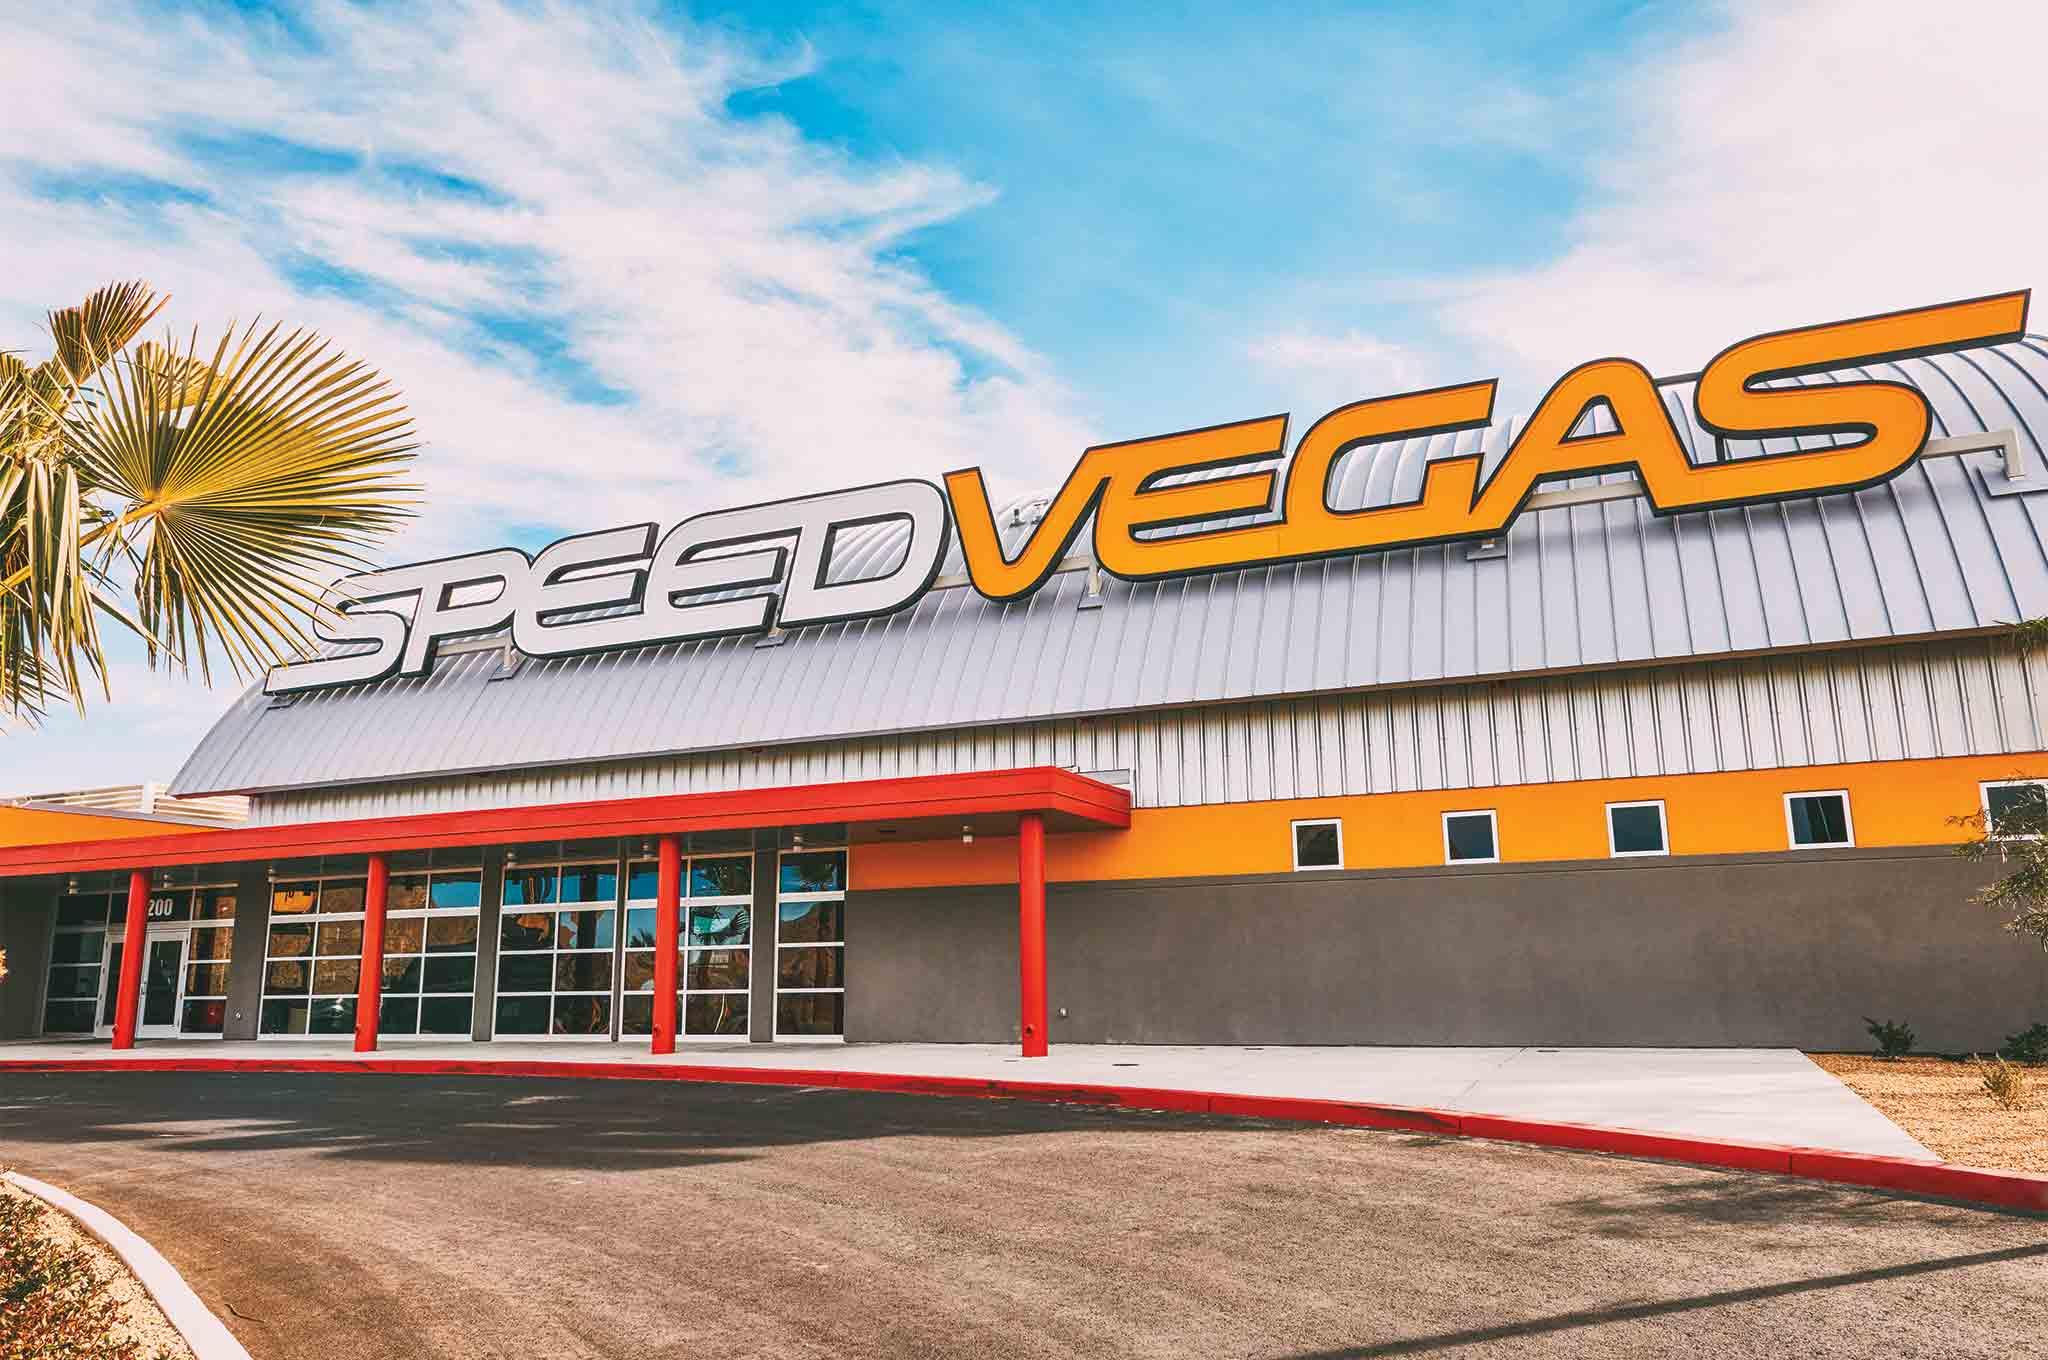 Speed Vegas 01